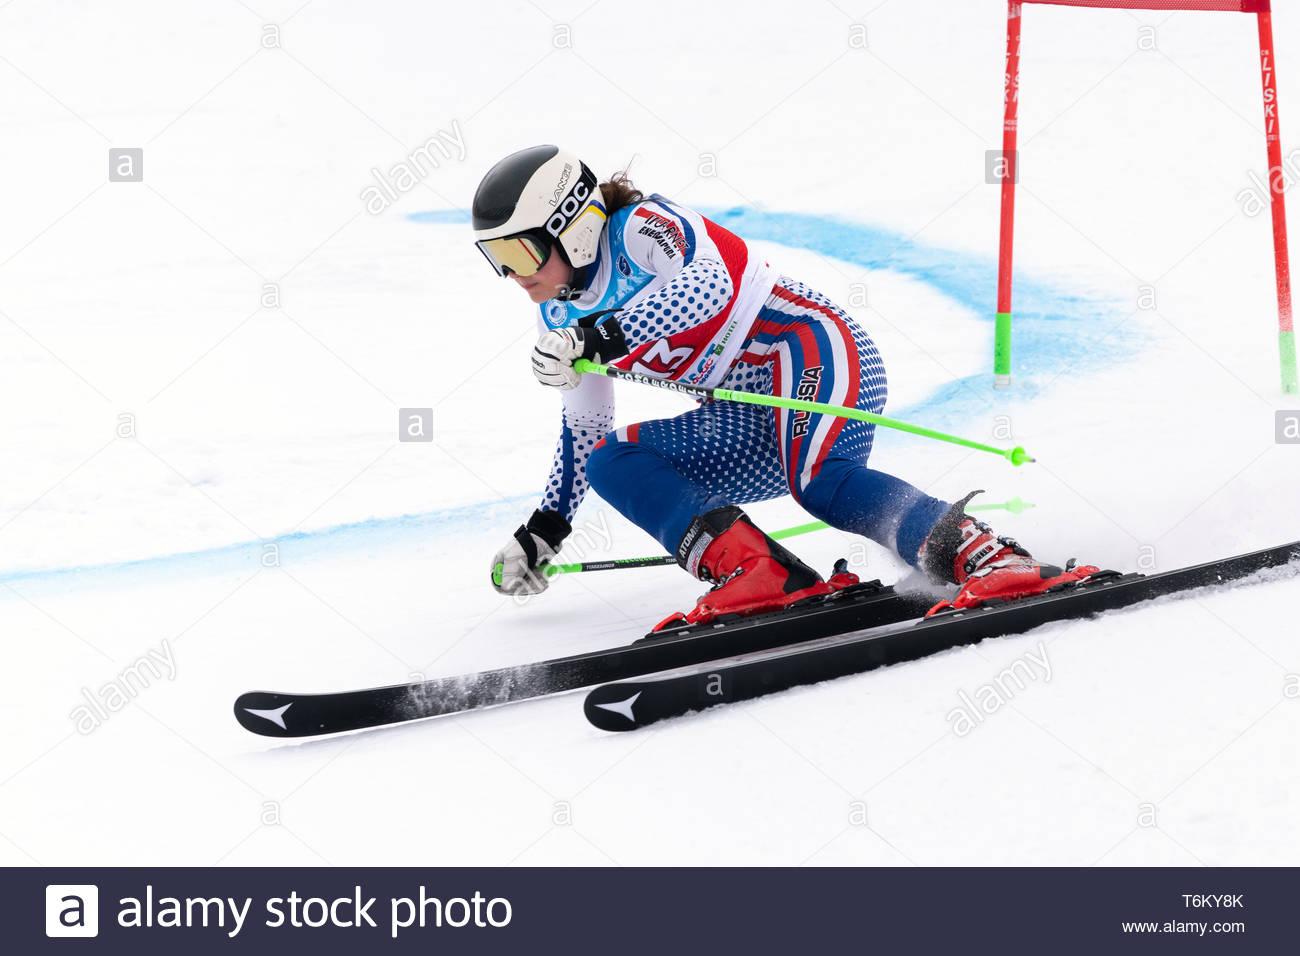 KAMCHATKA, RUSSIA - APR 2, 2019: Russian Women's Alpine Skiing Cup, International Ski Federation Championship, giant slalom. Mountain skier Khartsyzov - Stock Image